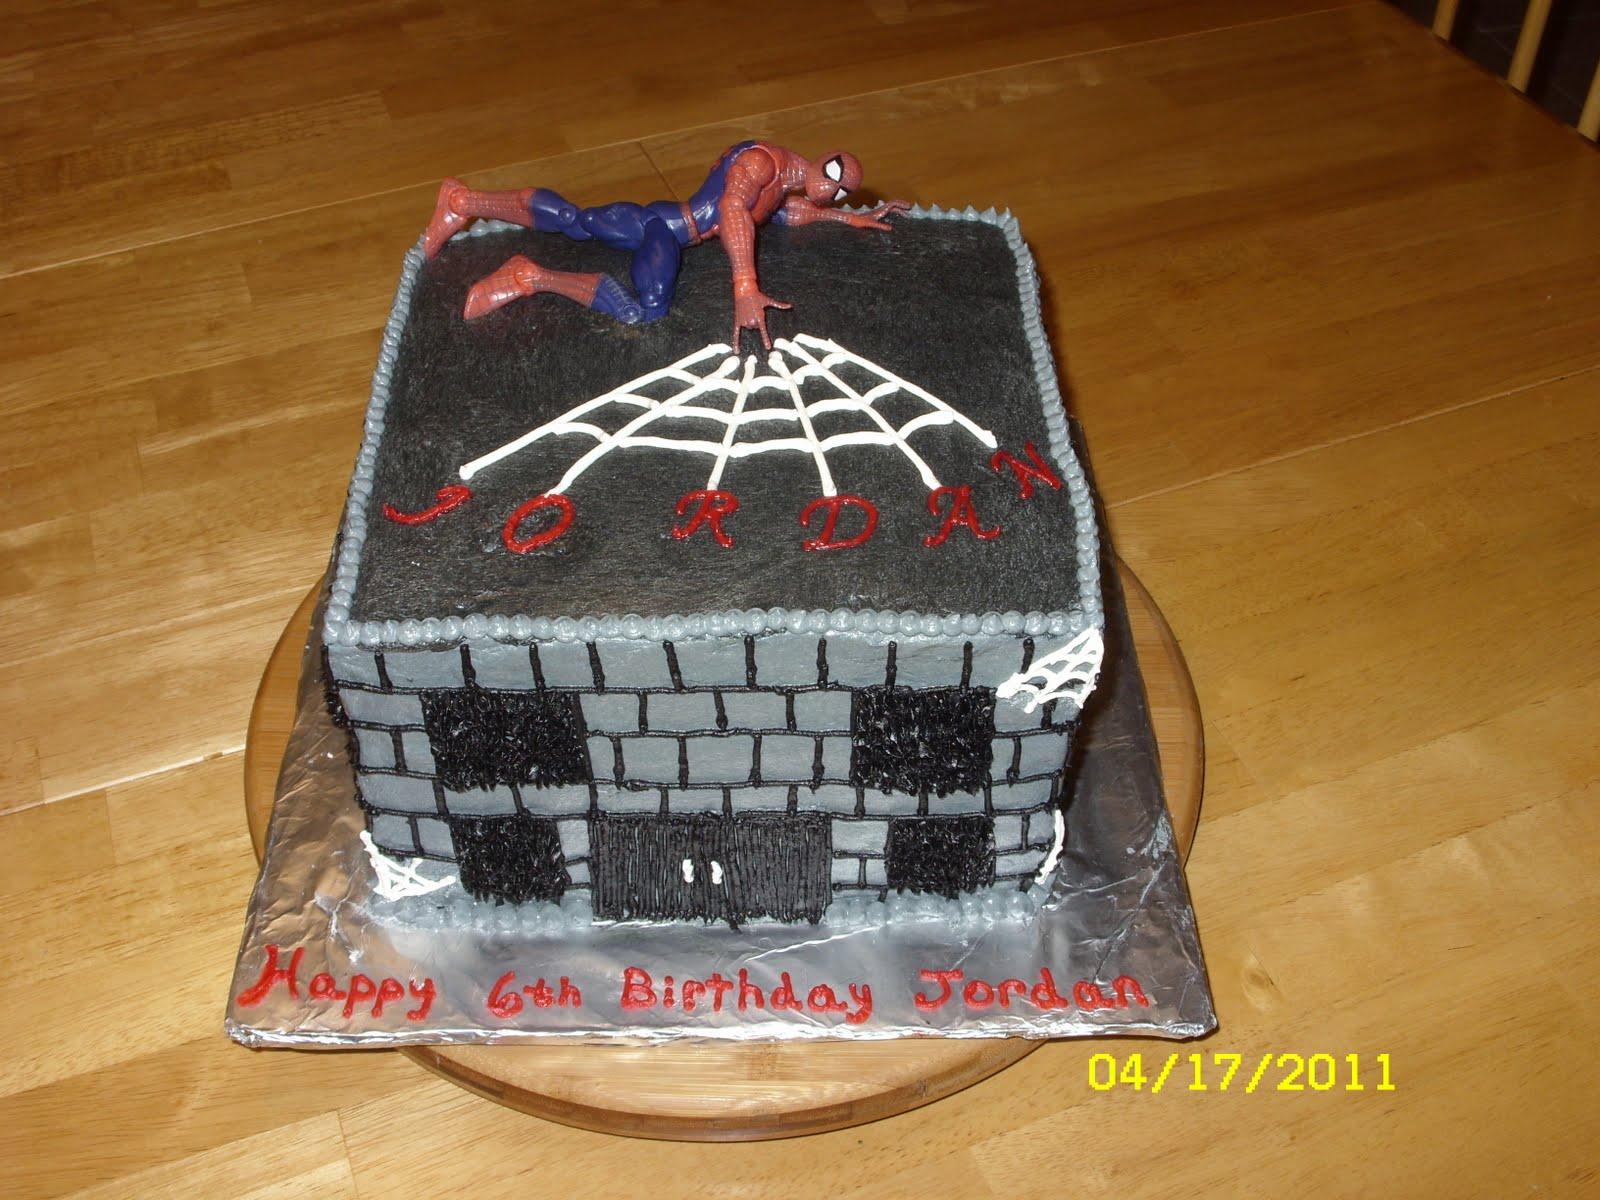 Free Cakes For Kids Killeen Our 18th Cake Spiderman For Jordan